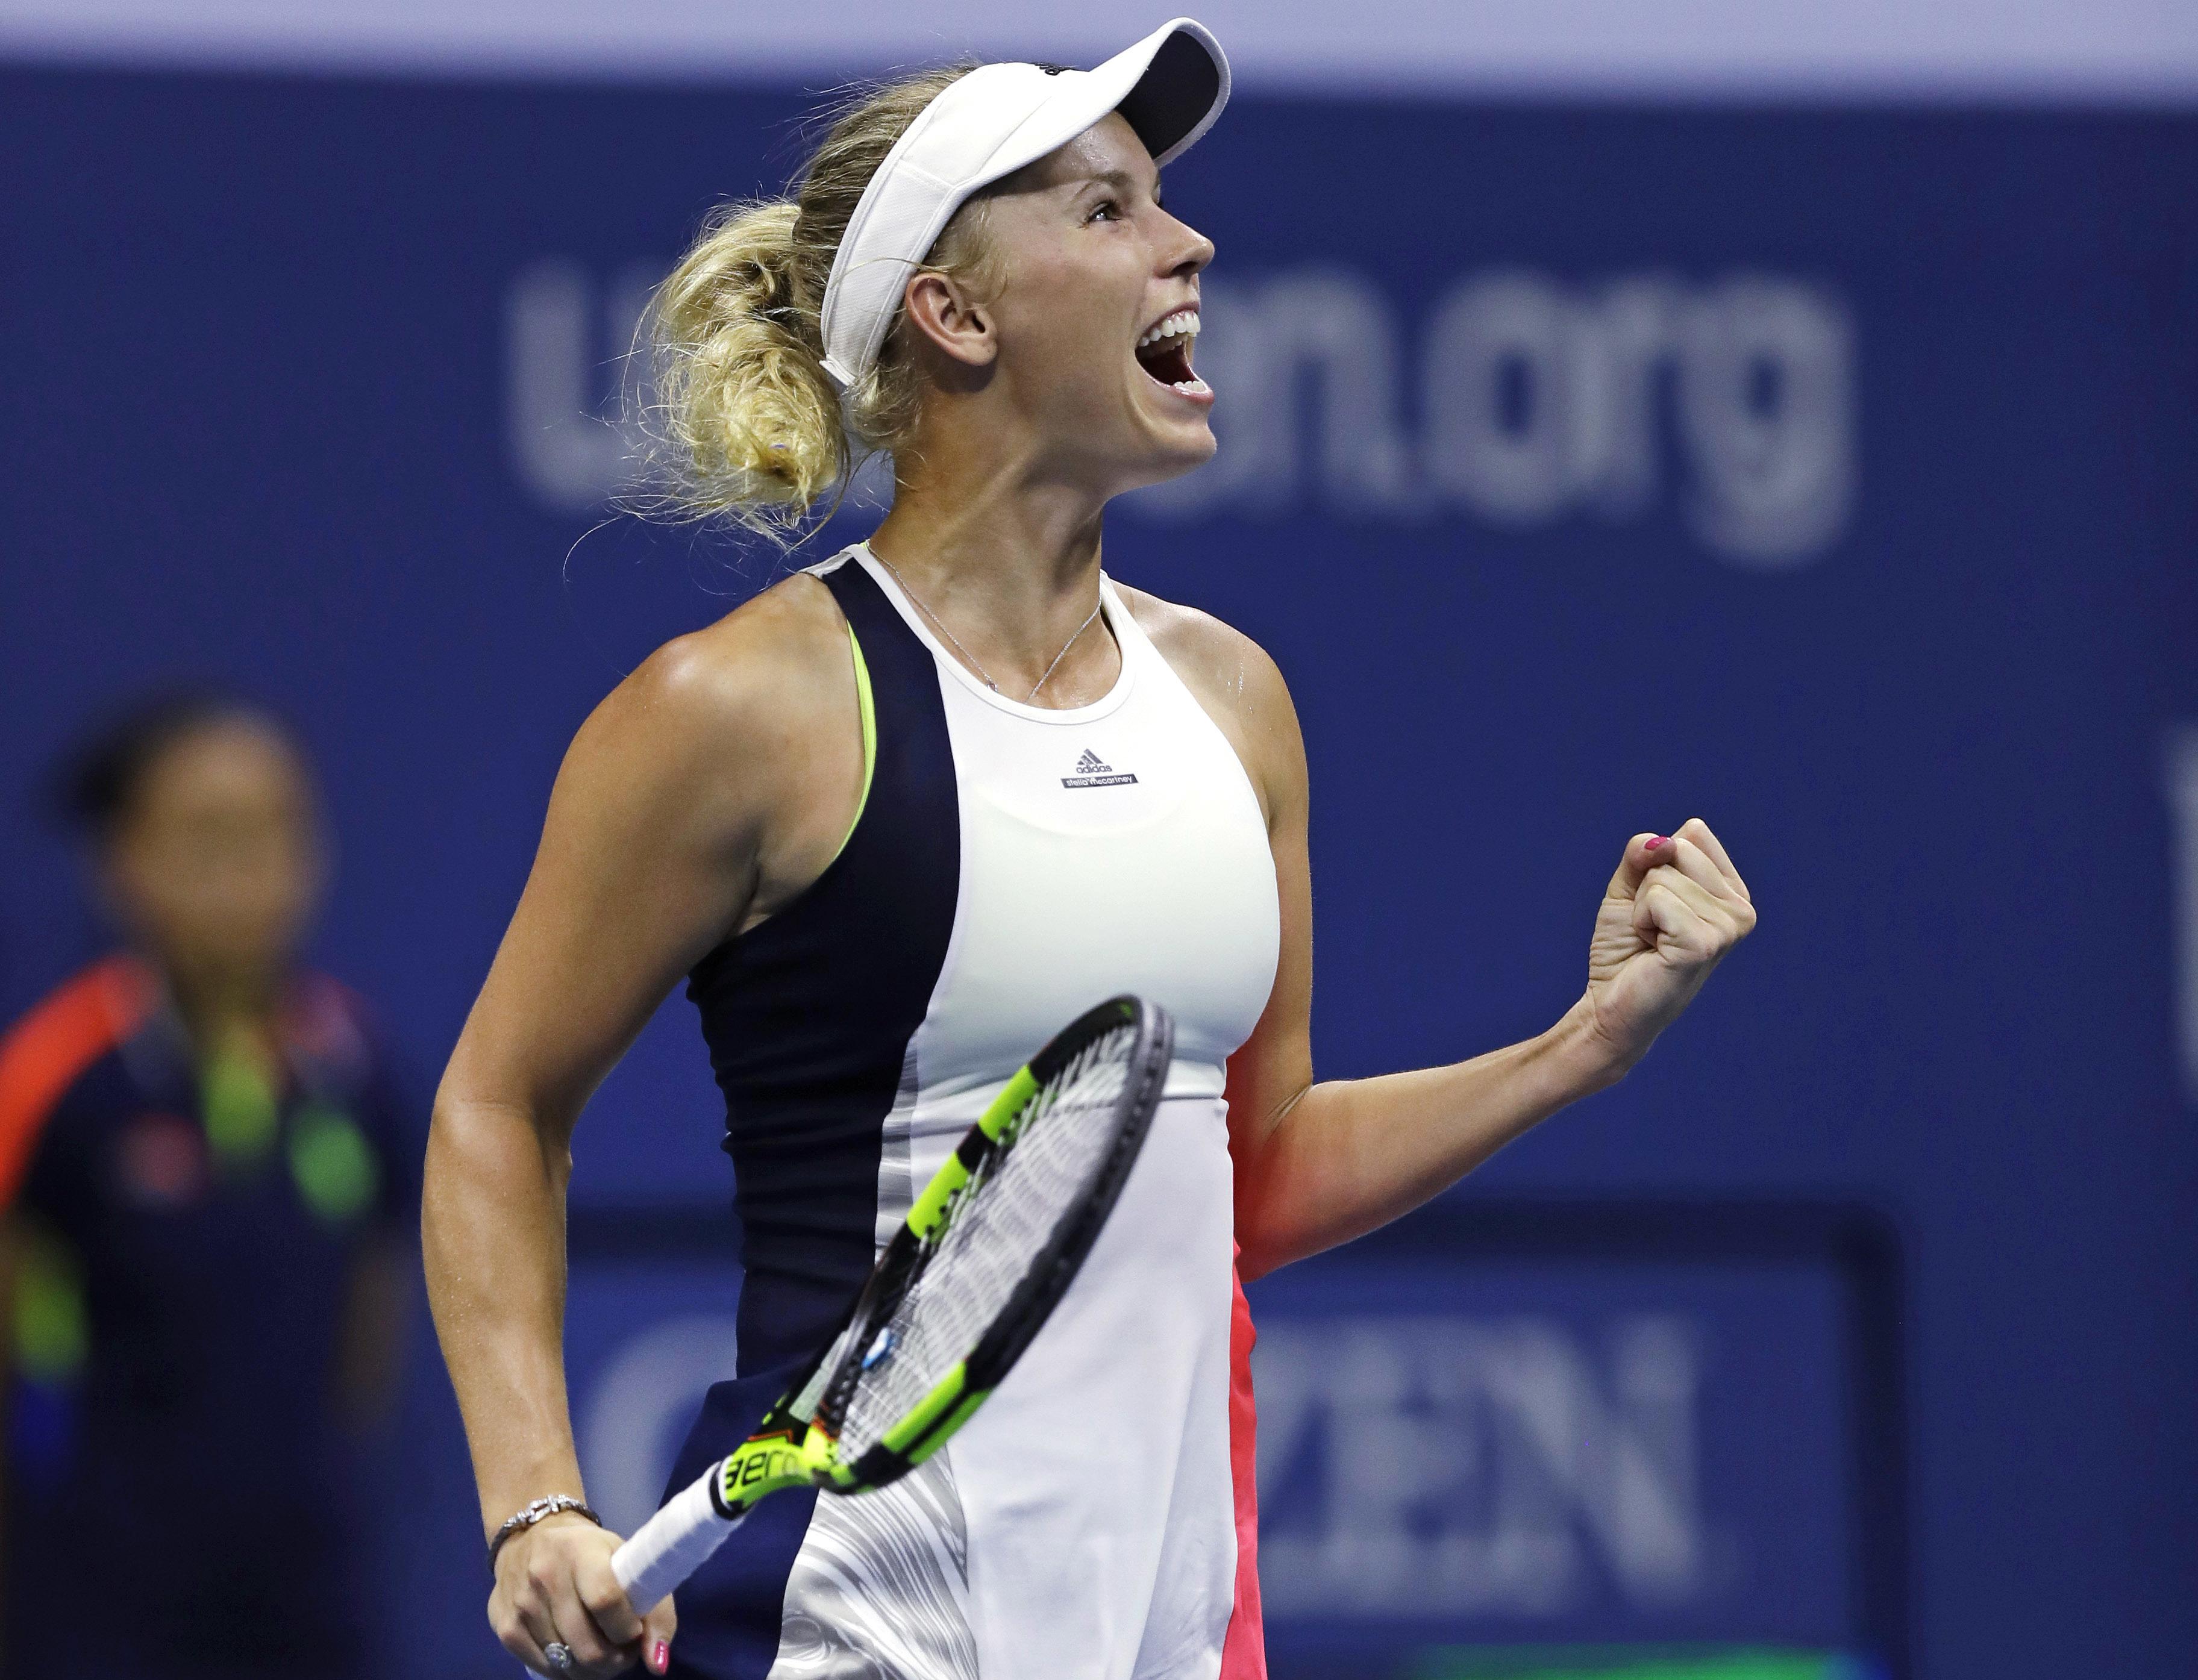 Caroline Wozniacki, of Denmark, pumps her fist after defeating Anastasija Sevastova, of Latvia, 6-0, 6-2 during a quarterfinal at the U.S. Open tennis tournament, Tuesday, Sept. 6, 2016, in New York. (AP Photo/Charles Krupa)